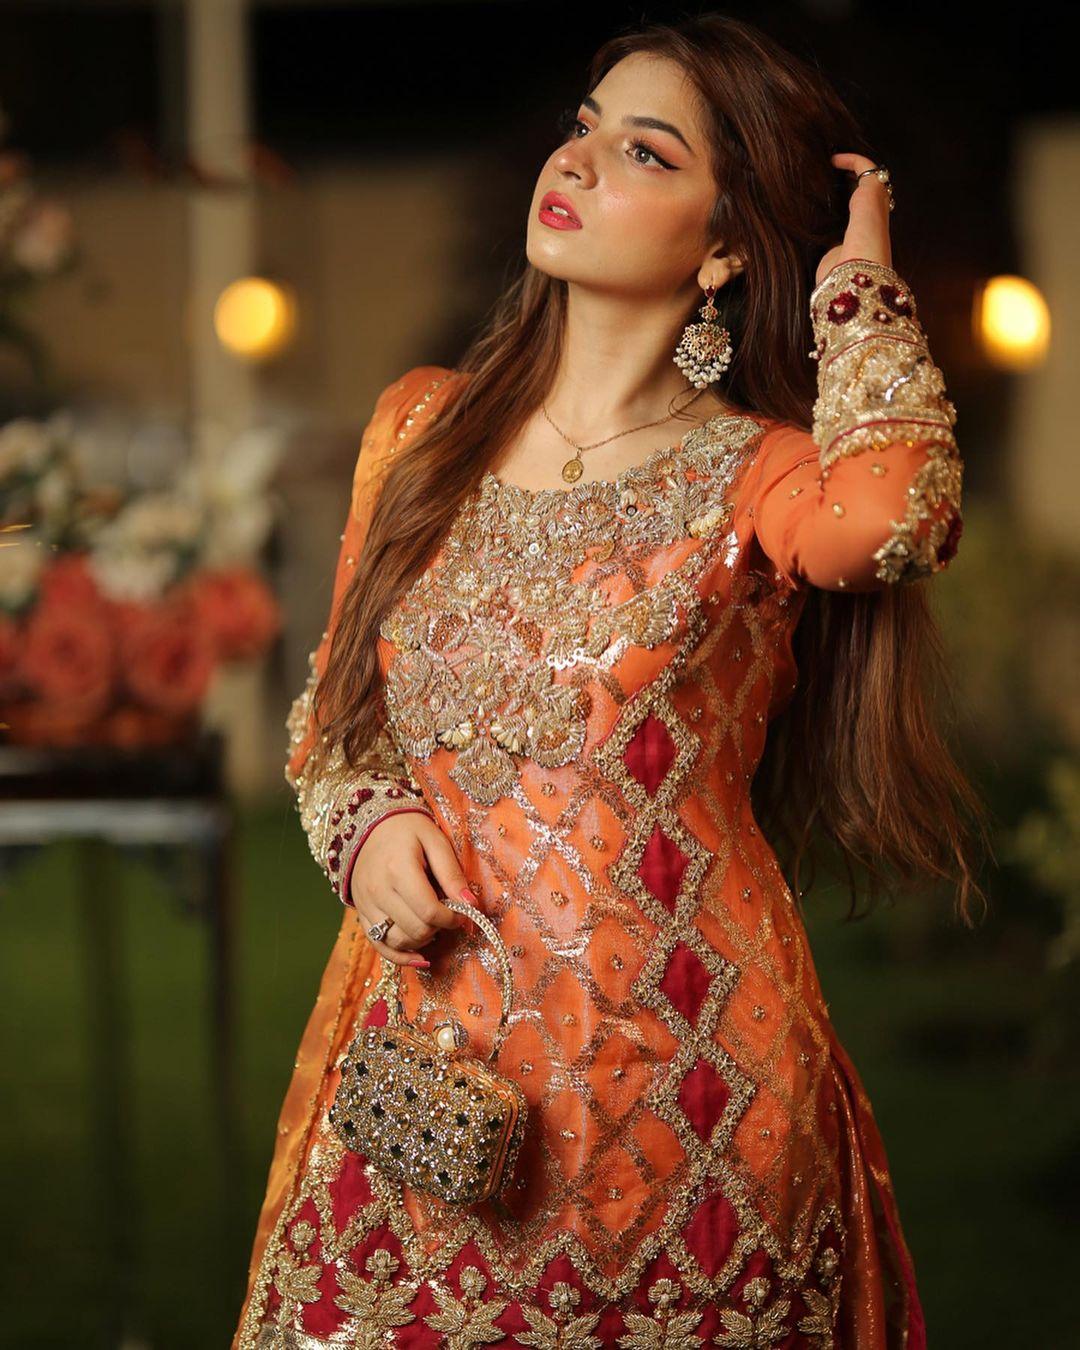 Dananeer pakistani viral girl